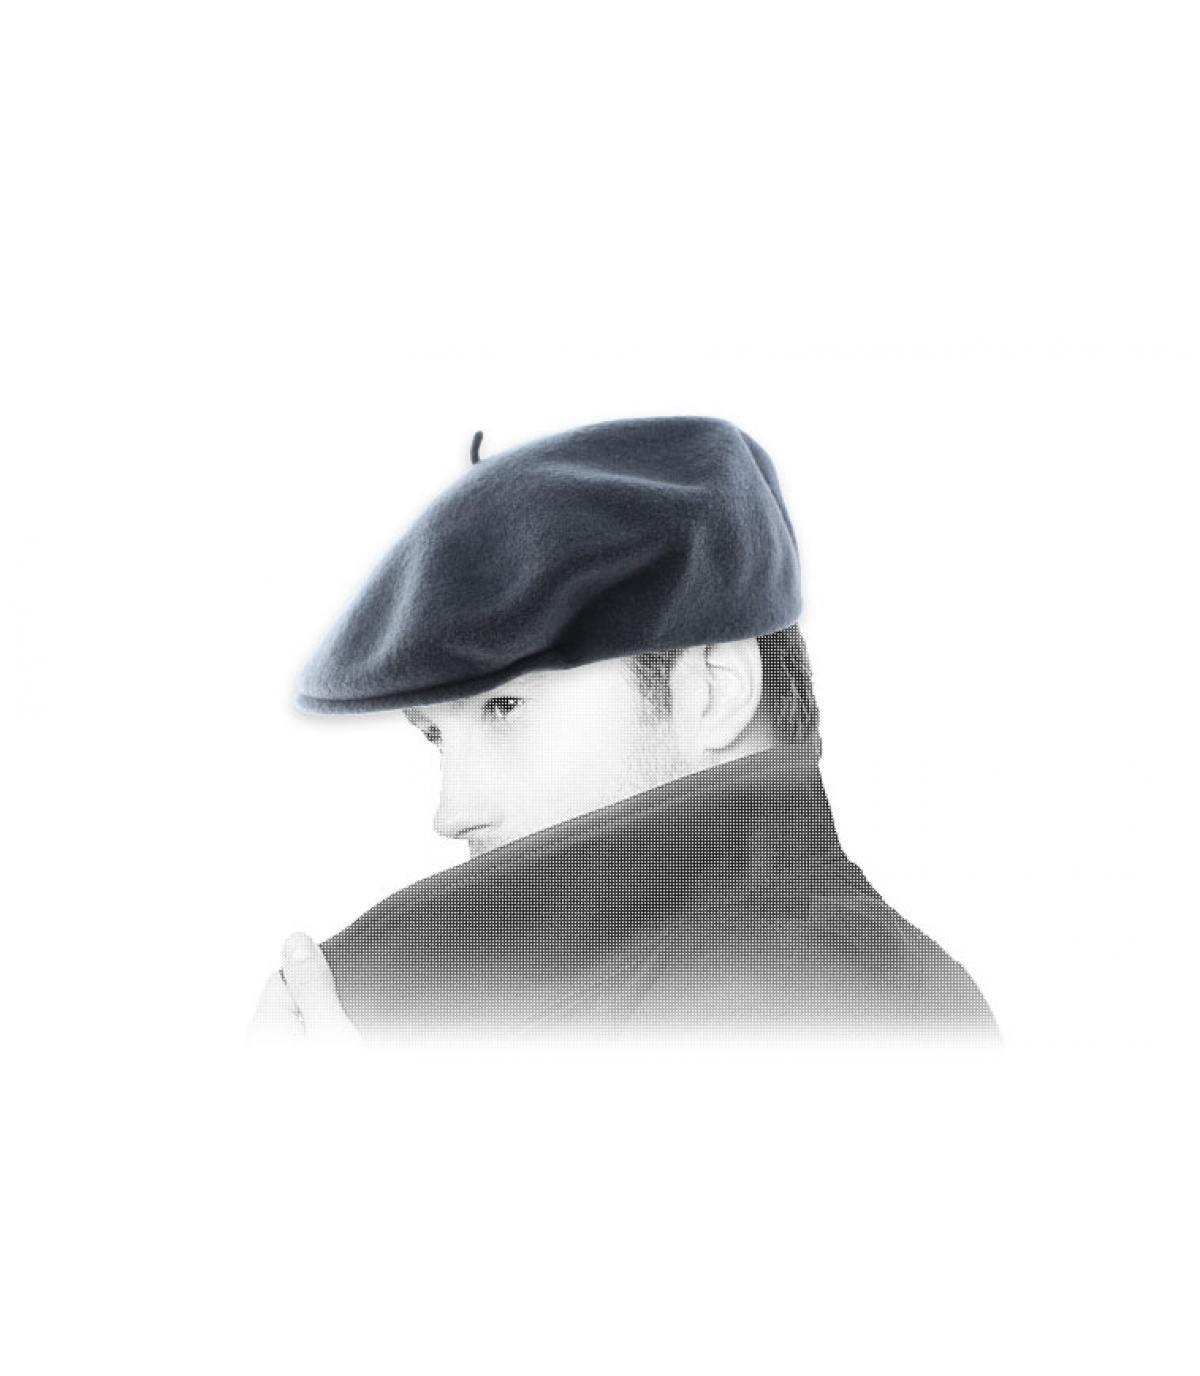 Barett grau Laulhère